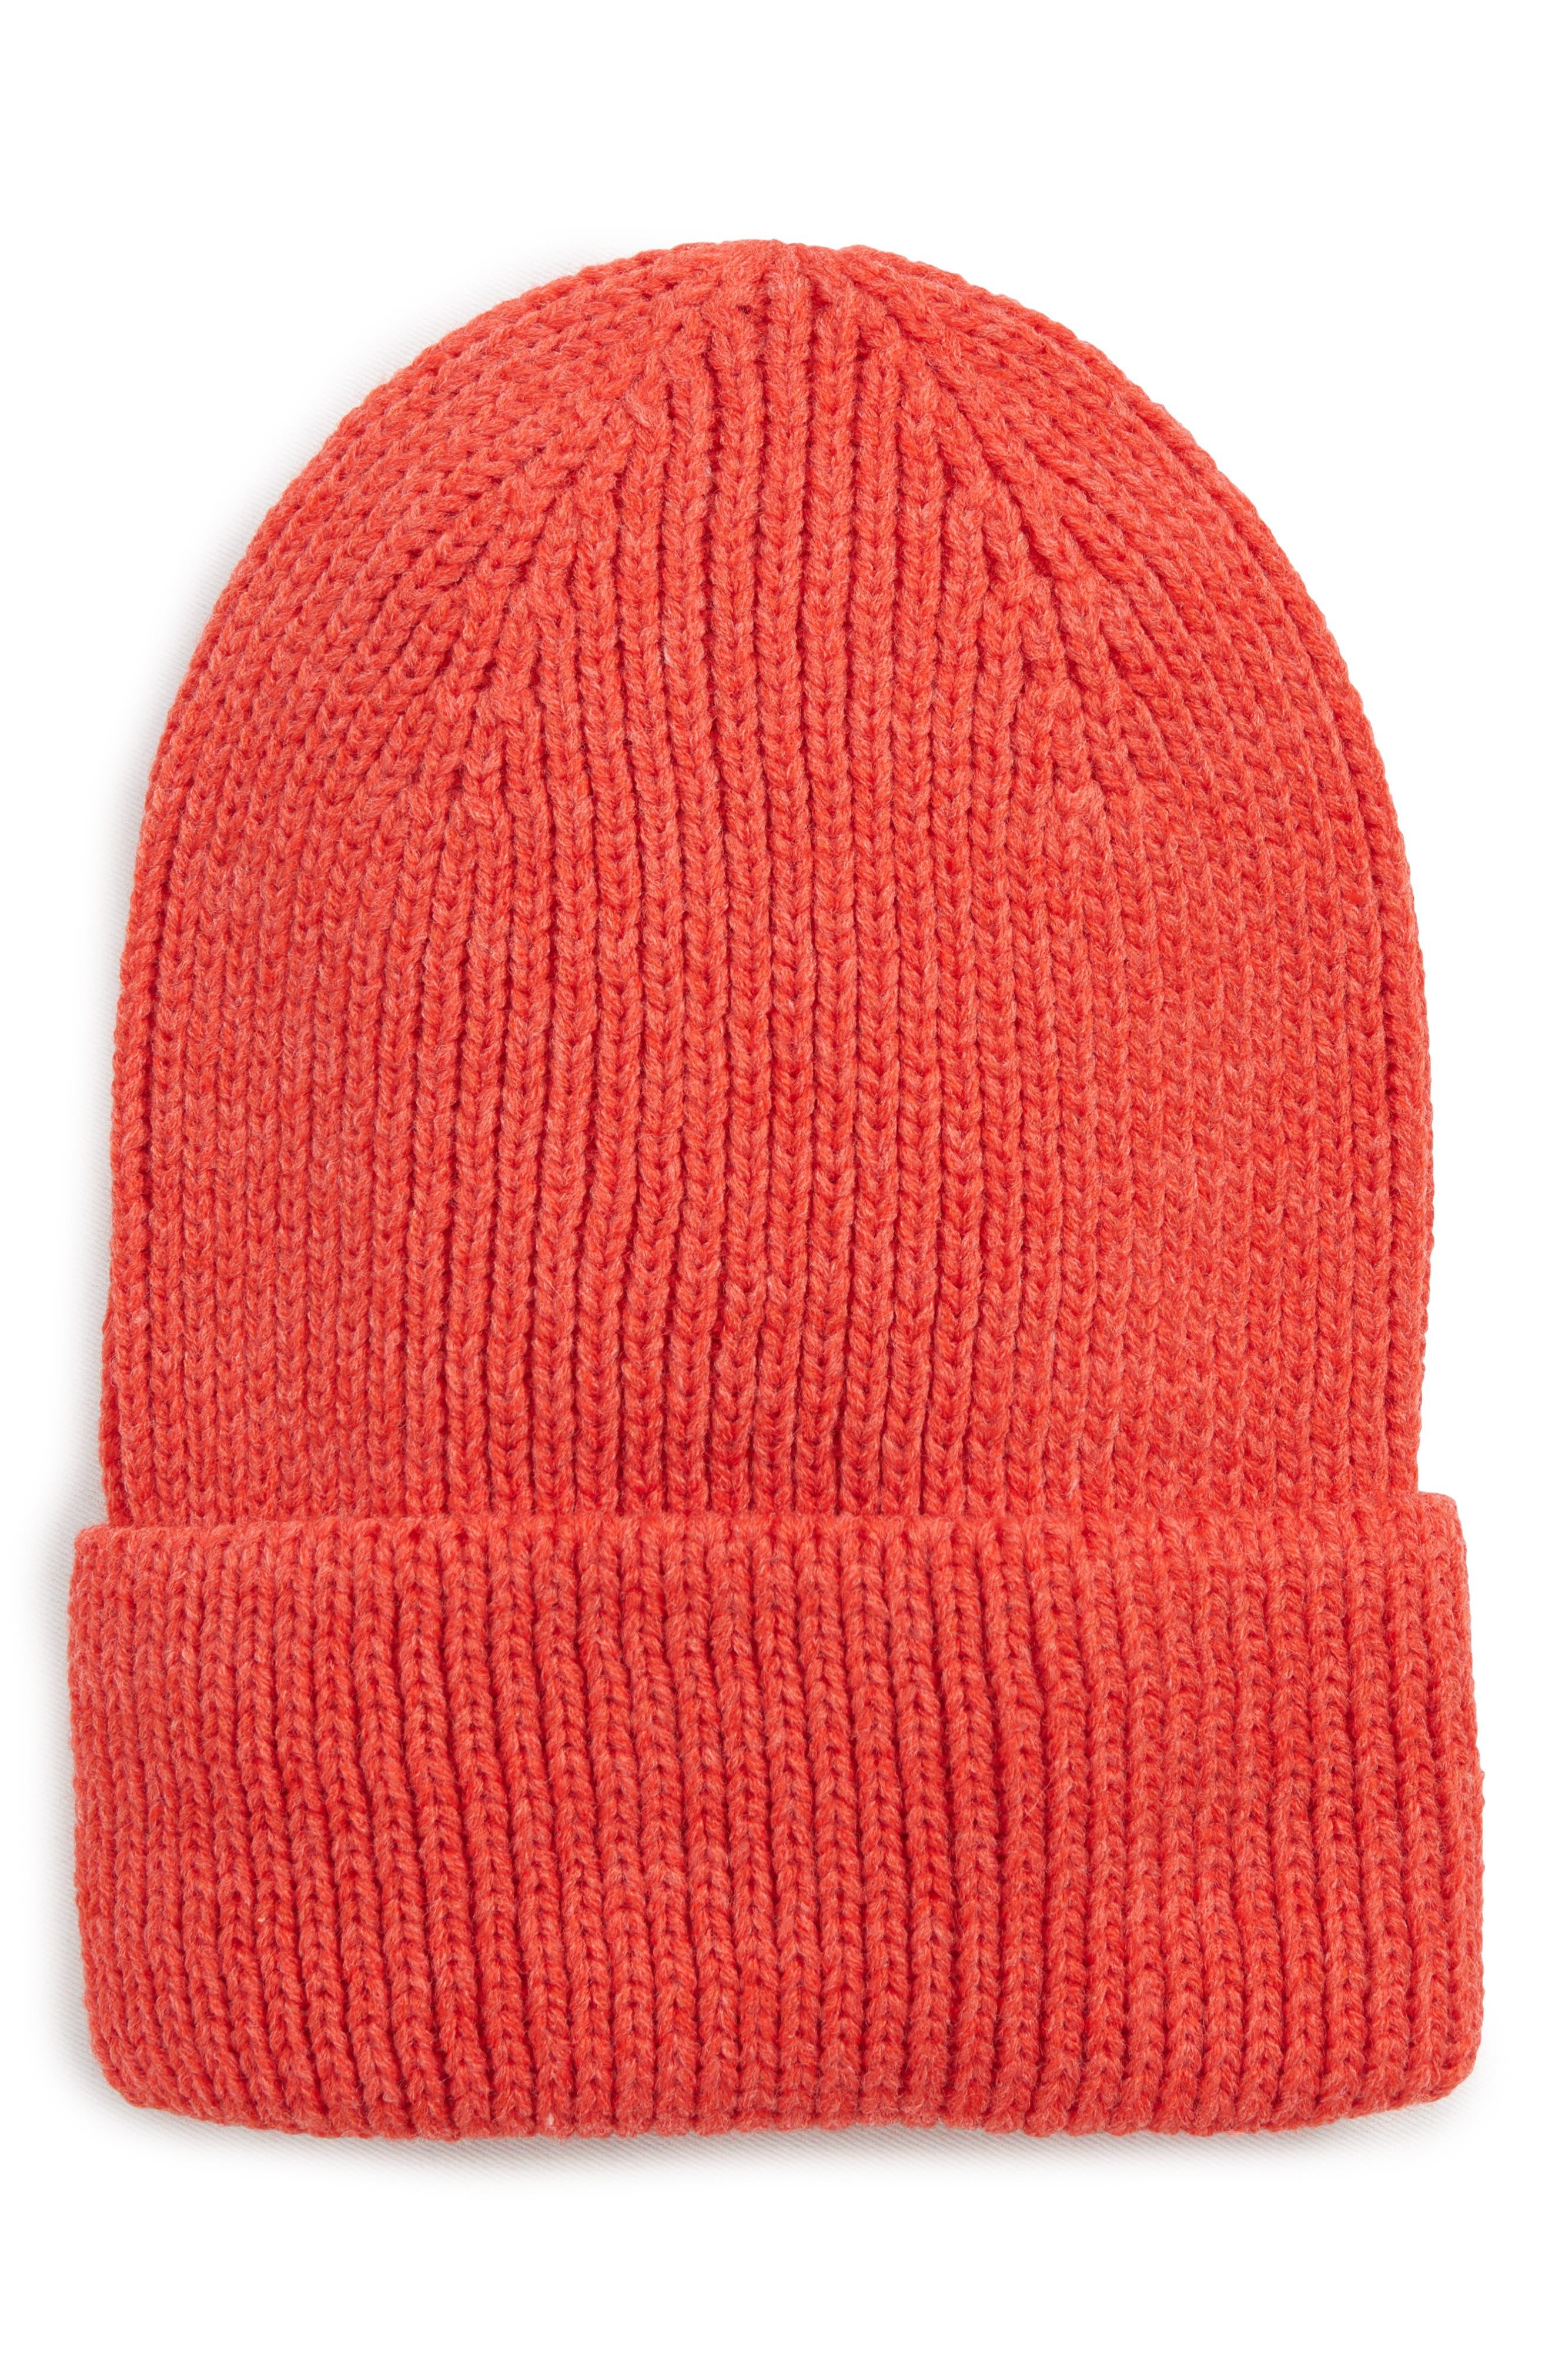 5a0a89083b4982 ... hat 7bca3 0ff97; best price all mens hats sale nordstrom 8c896 eaf48